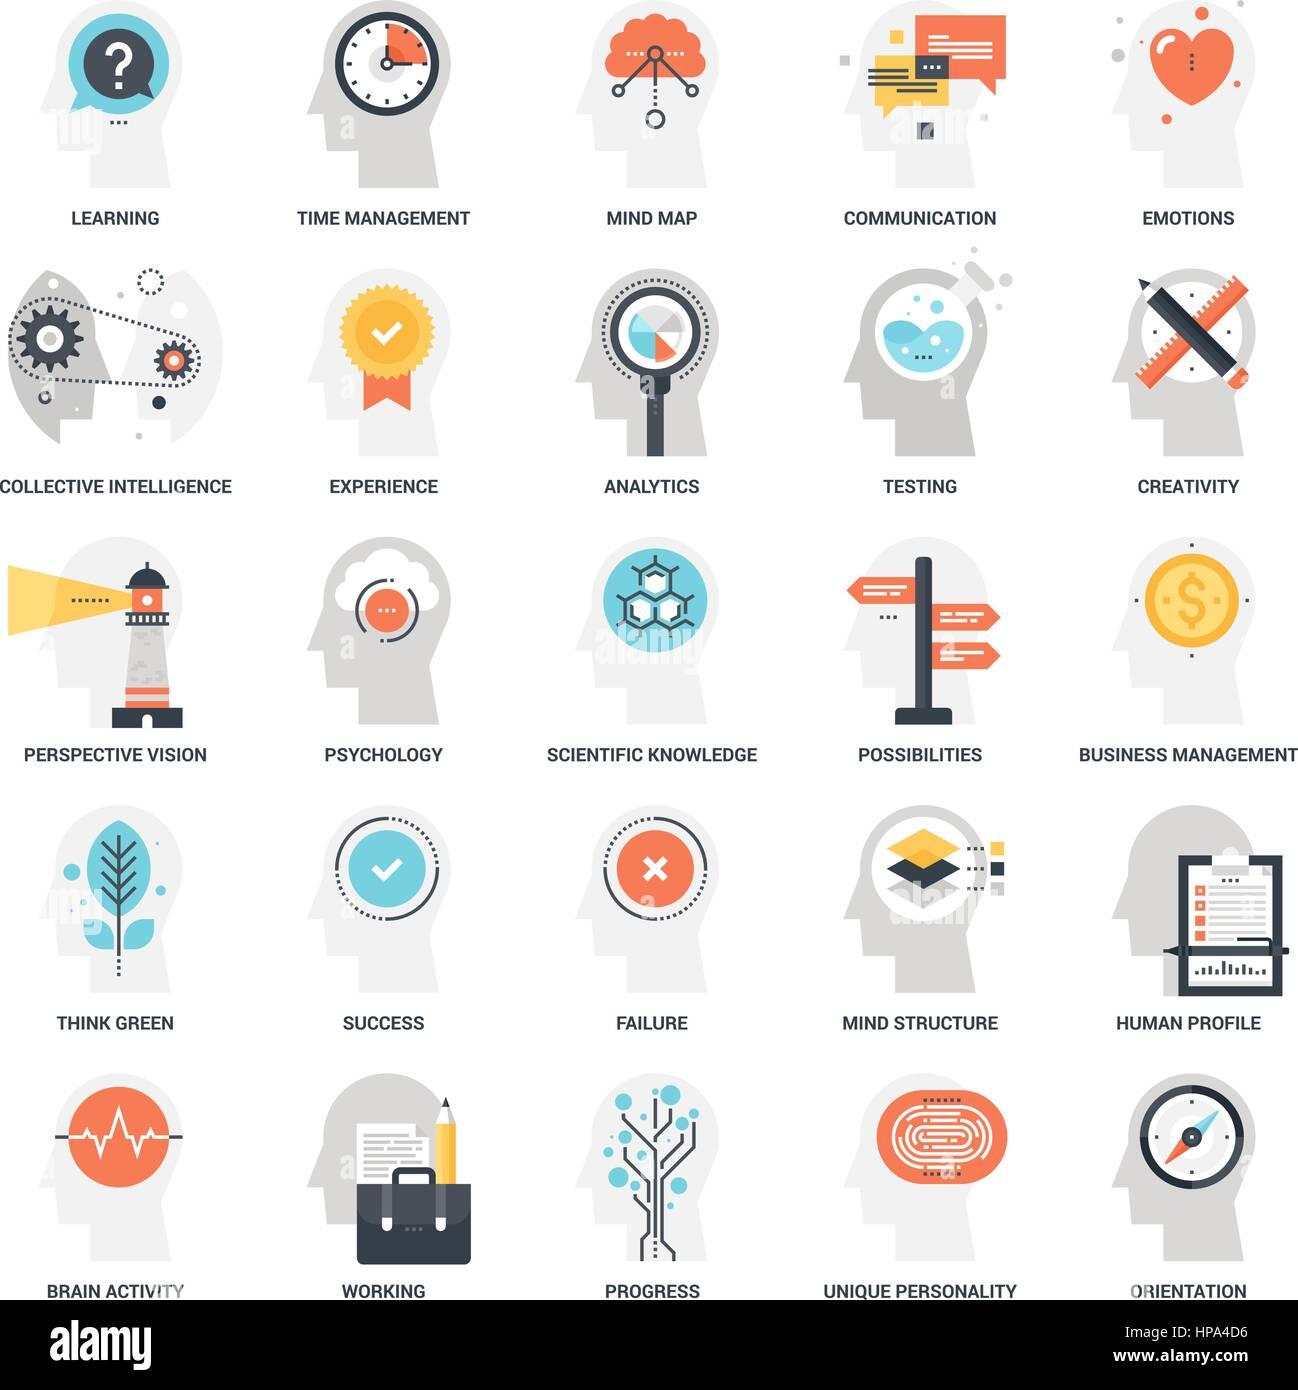 Thinking and Brain Activity - Stock Image